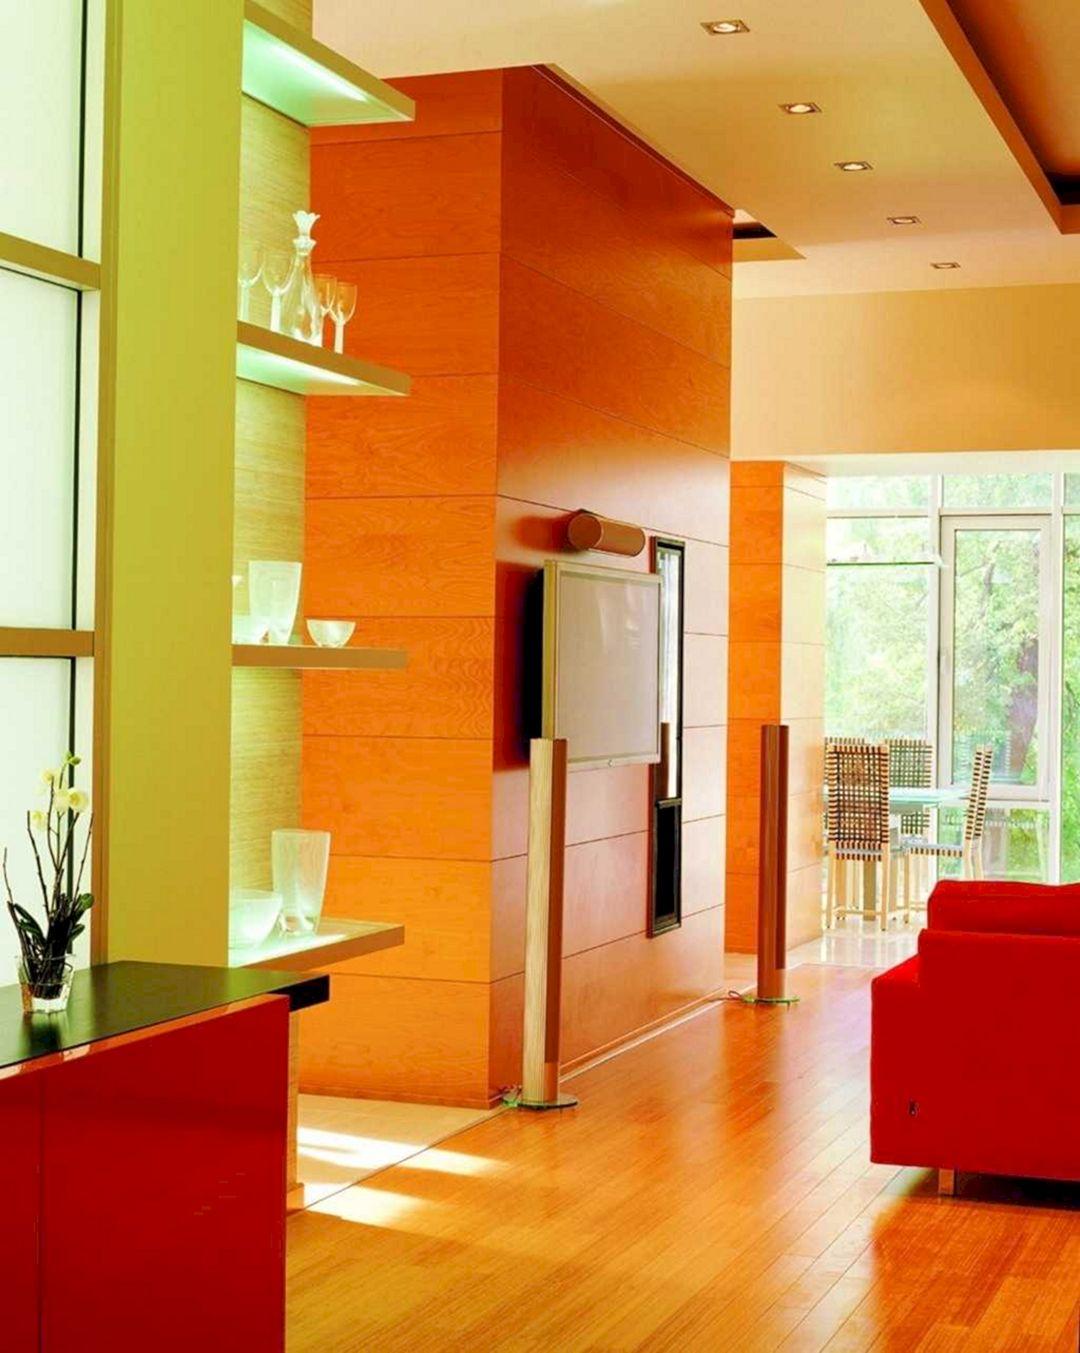 Home Wall Interior Design Ideas 20